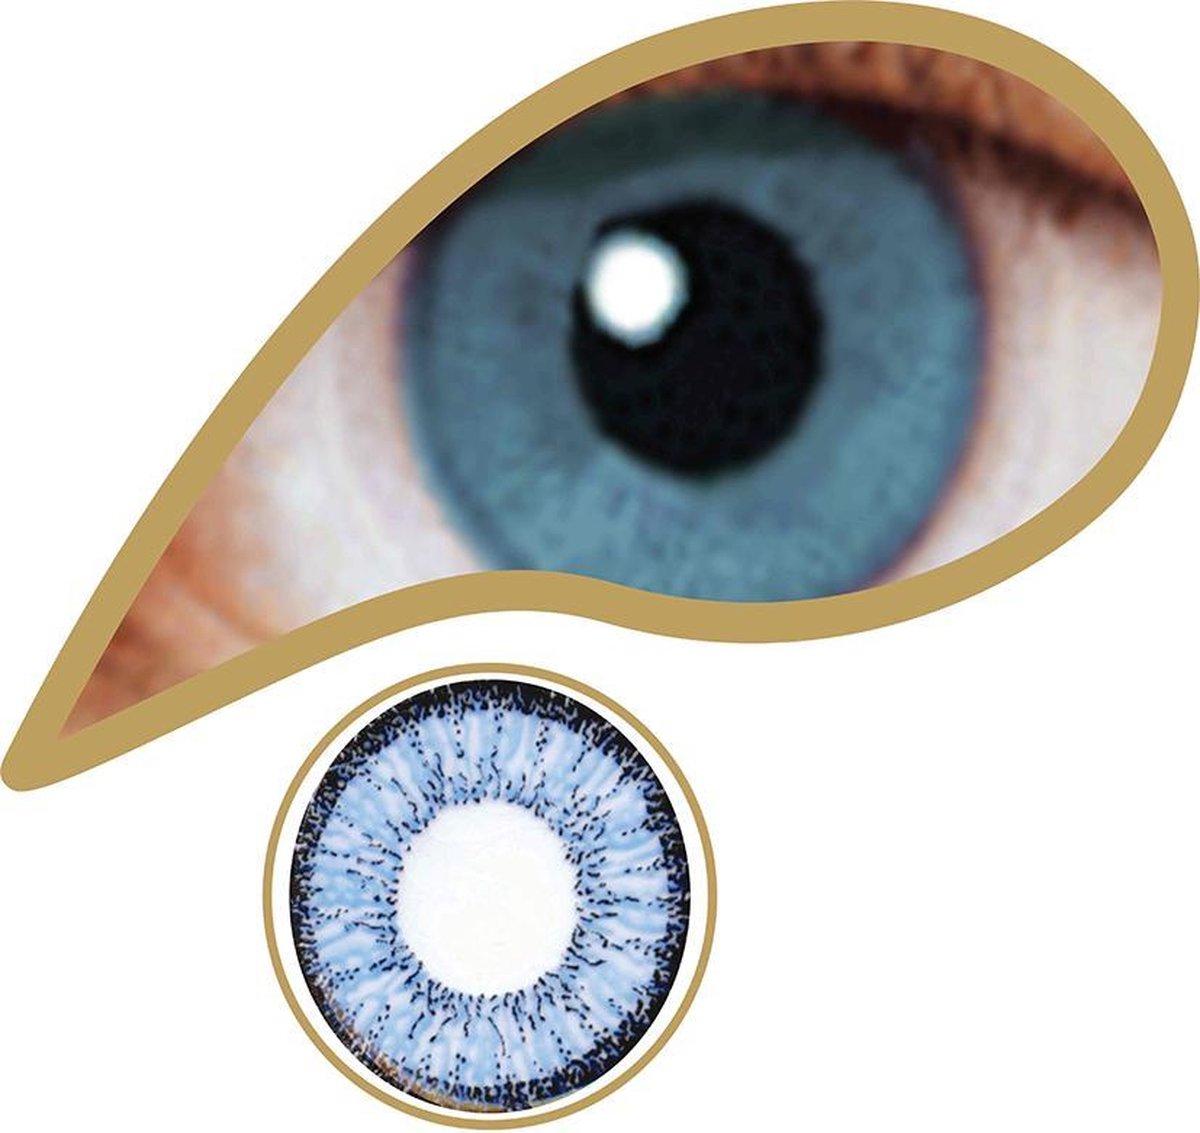 MesmerEyez - Blue - Real Blue - 1 dag lens - MesmerEyez